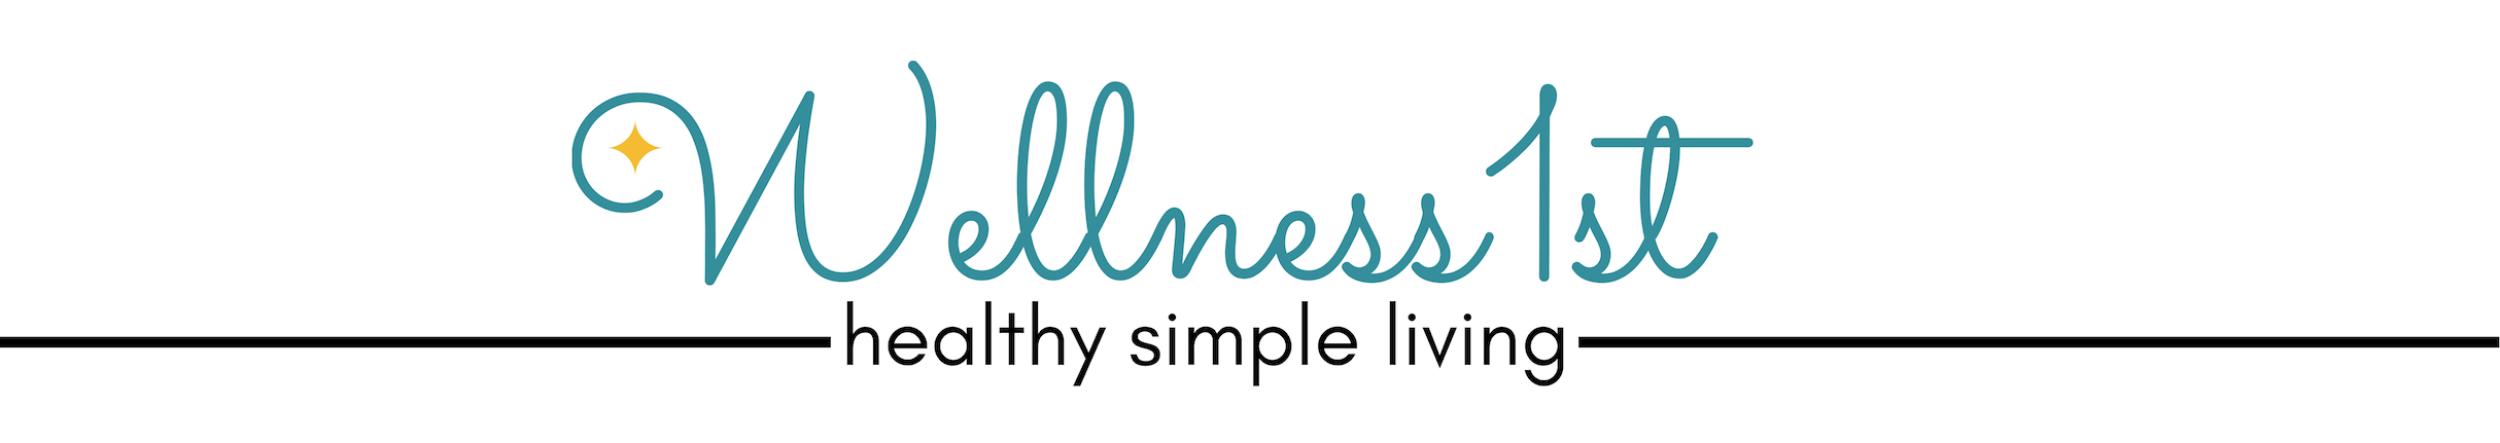 Wellness 1st